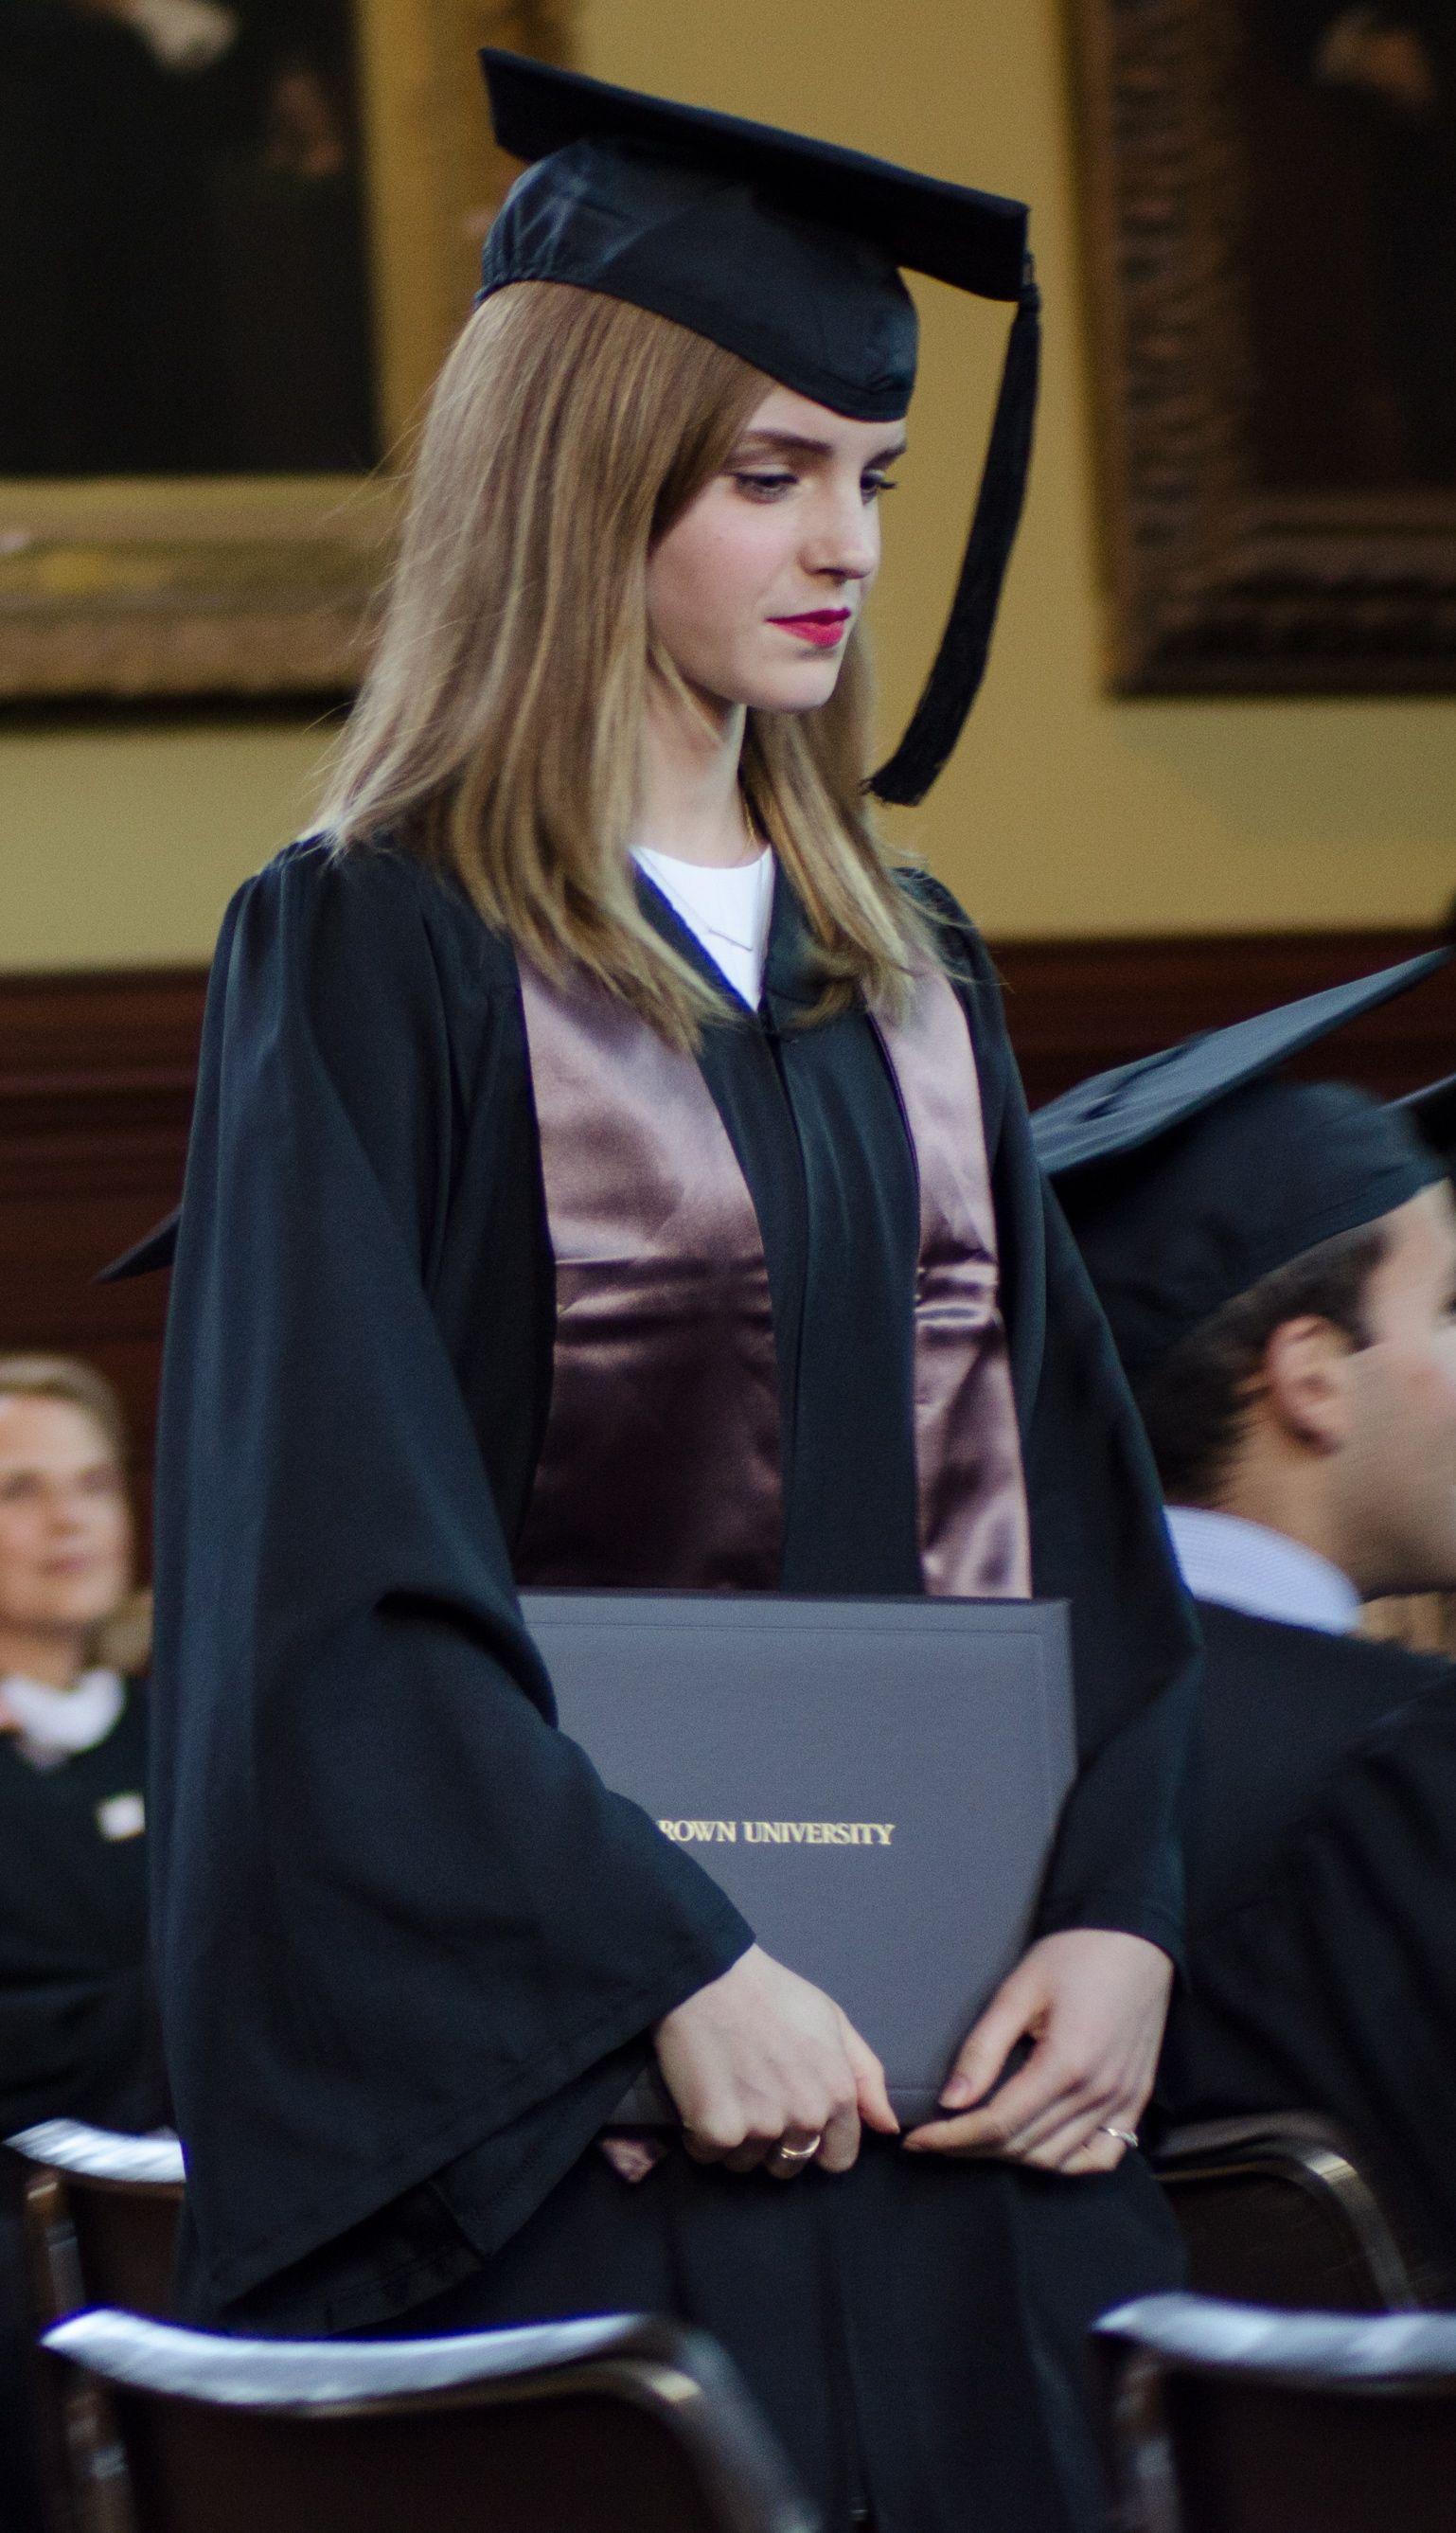 Emma Watsons Boyfriend Bling Ring Celebrity Dating Other Oxford University Scholar Matt Janney